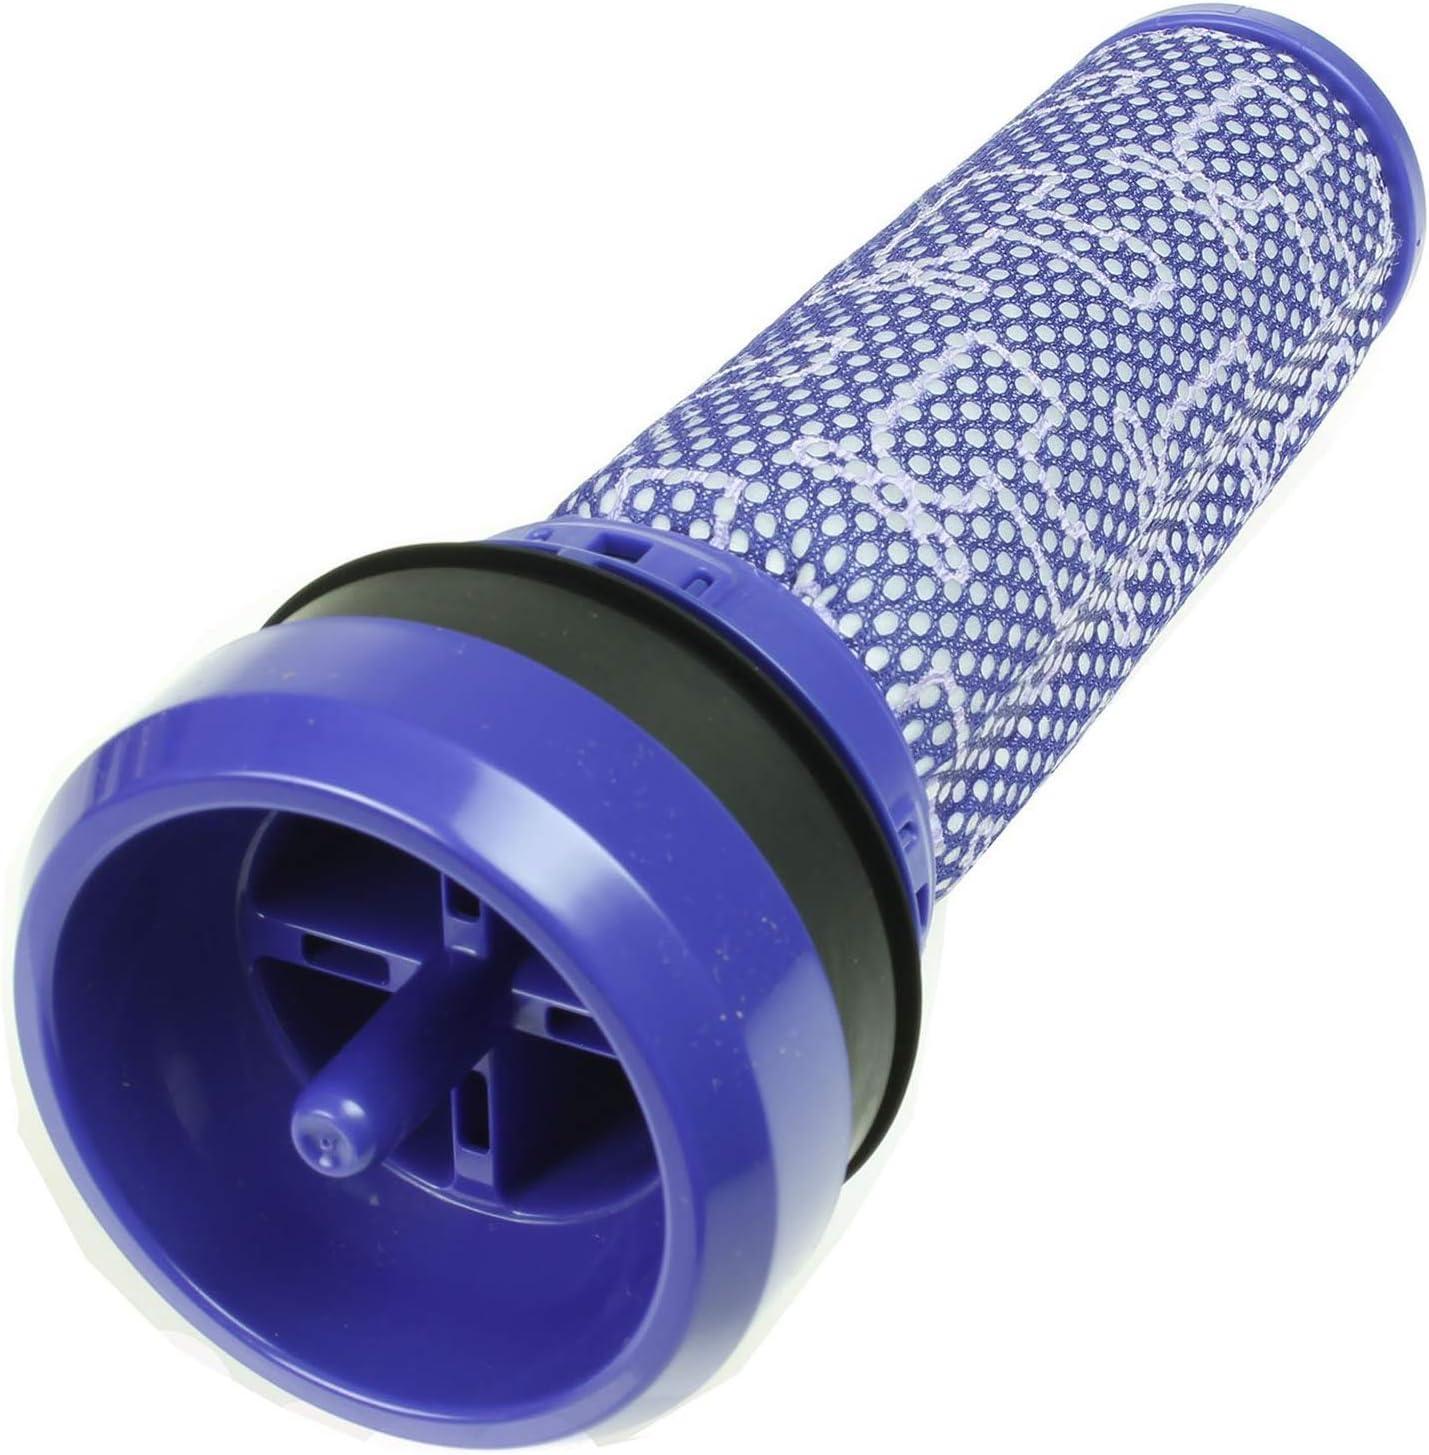 Find A Spare - Filtro prelavado lavable para aspiradora Dyson DC28 DC28C DC37 DC39 DC39i DC53: Amazon.es: Hogar